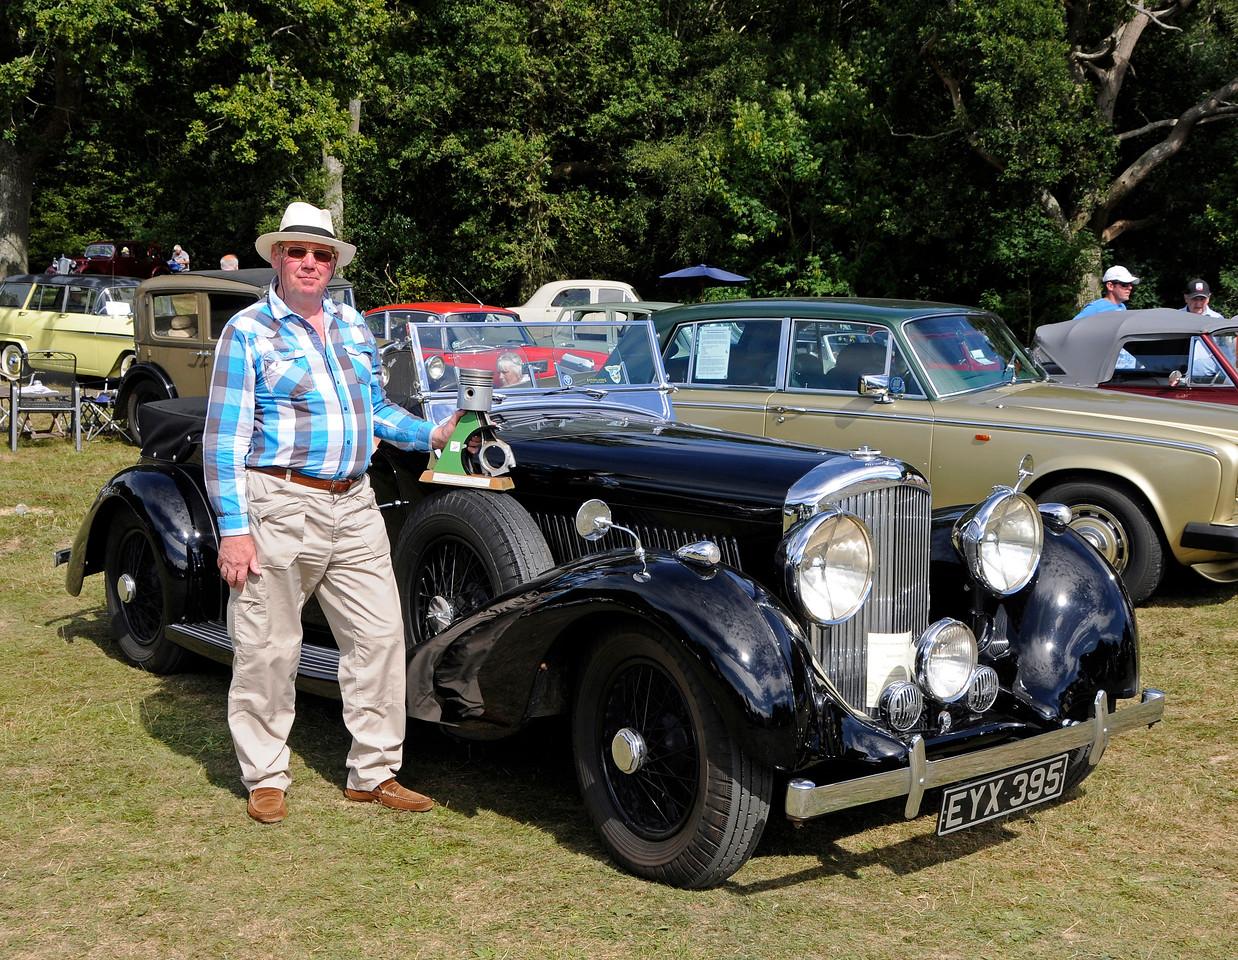 Best in Show winner Mike Ryan poses with his Bentley 4 1/4 Overdrive, EYX395.  Vintage Transport Weekend, Horsted Keynes.  09.08.2015   13683